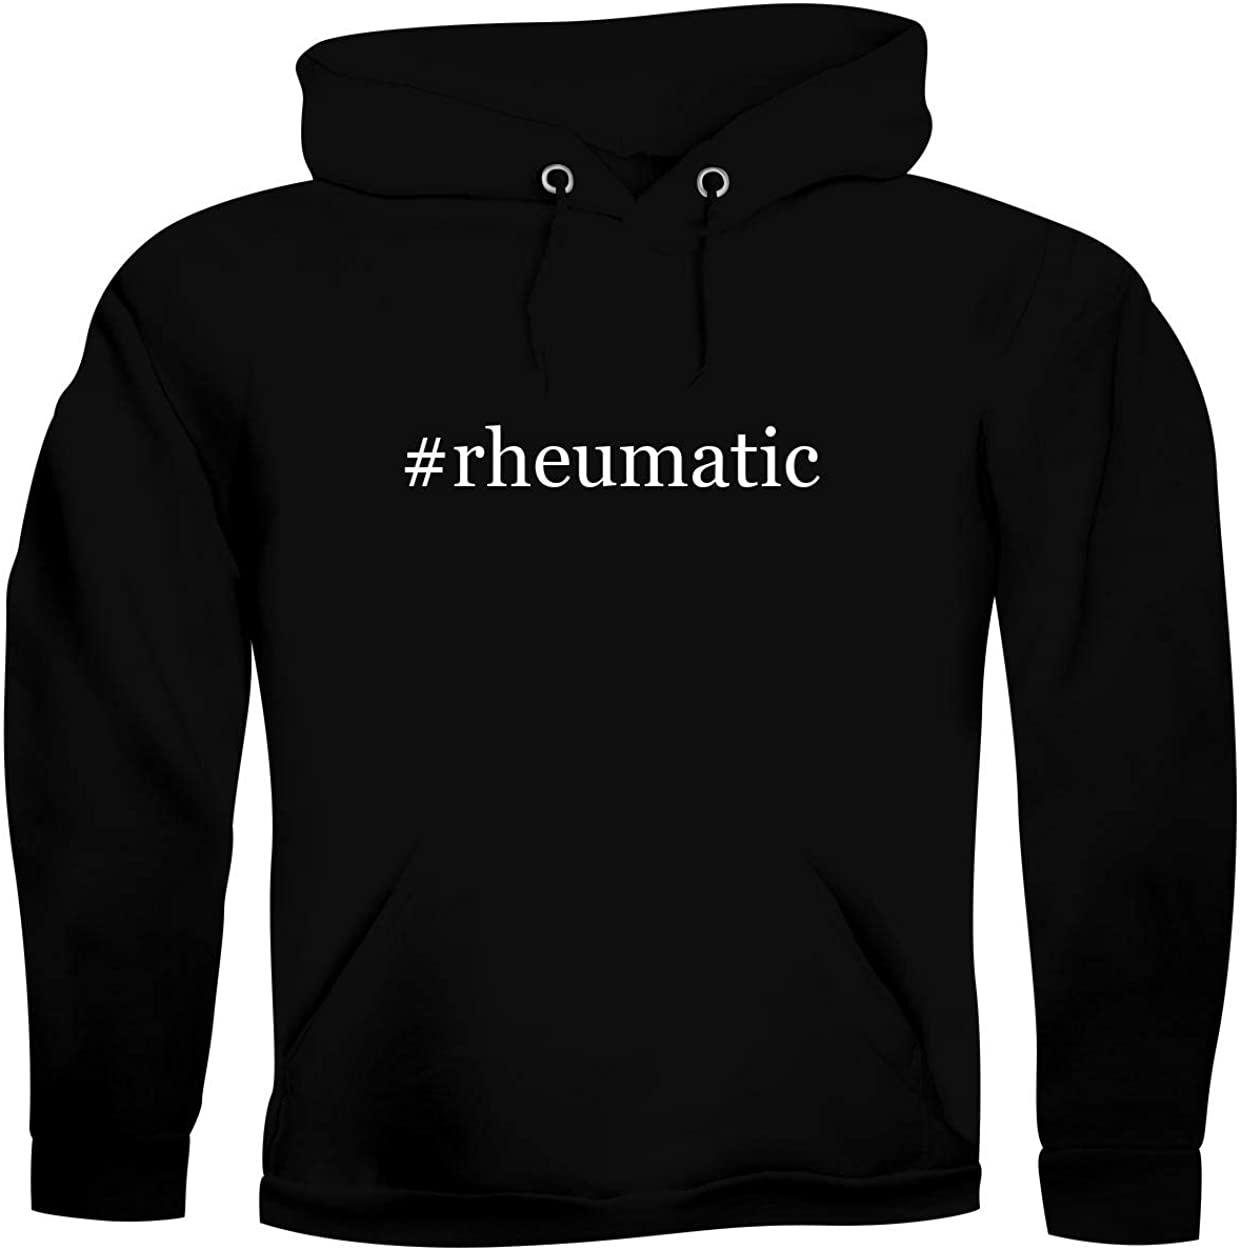 #rheumatic - Men's Hashtag Ultra Soft Hoodie Sweatshirt